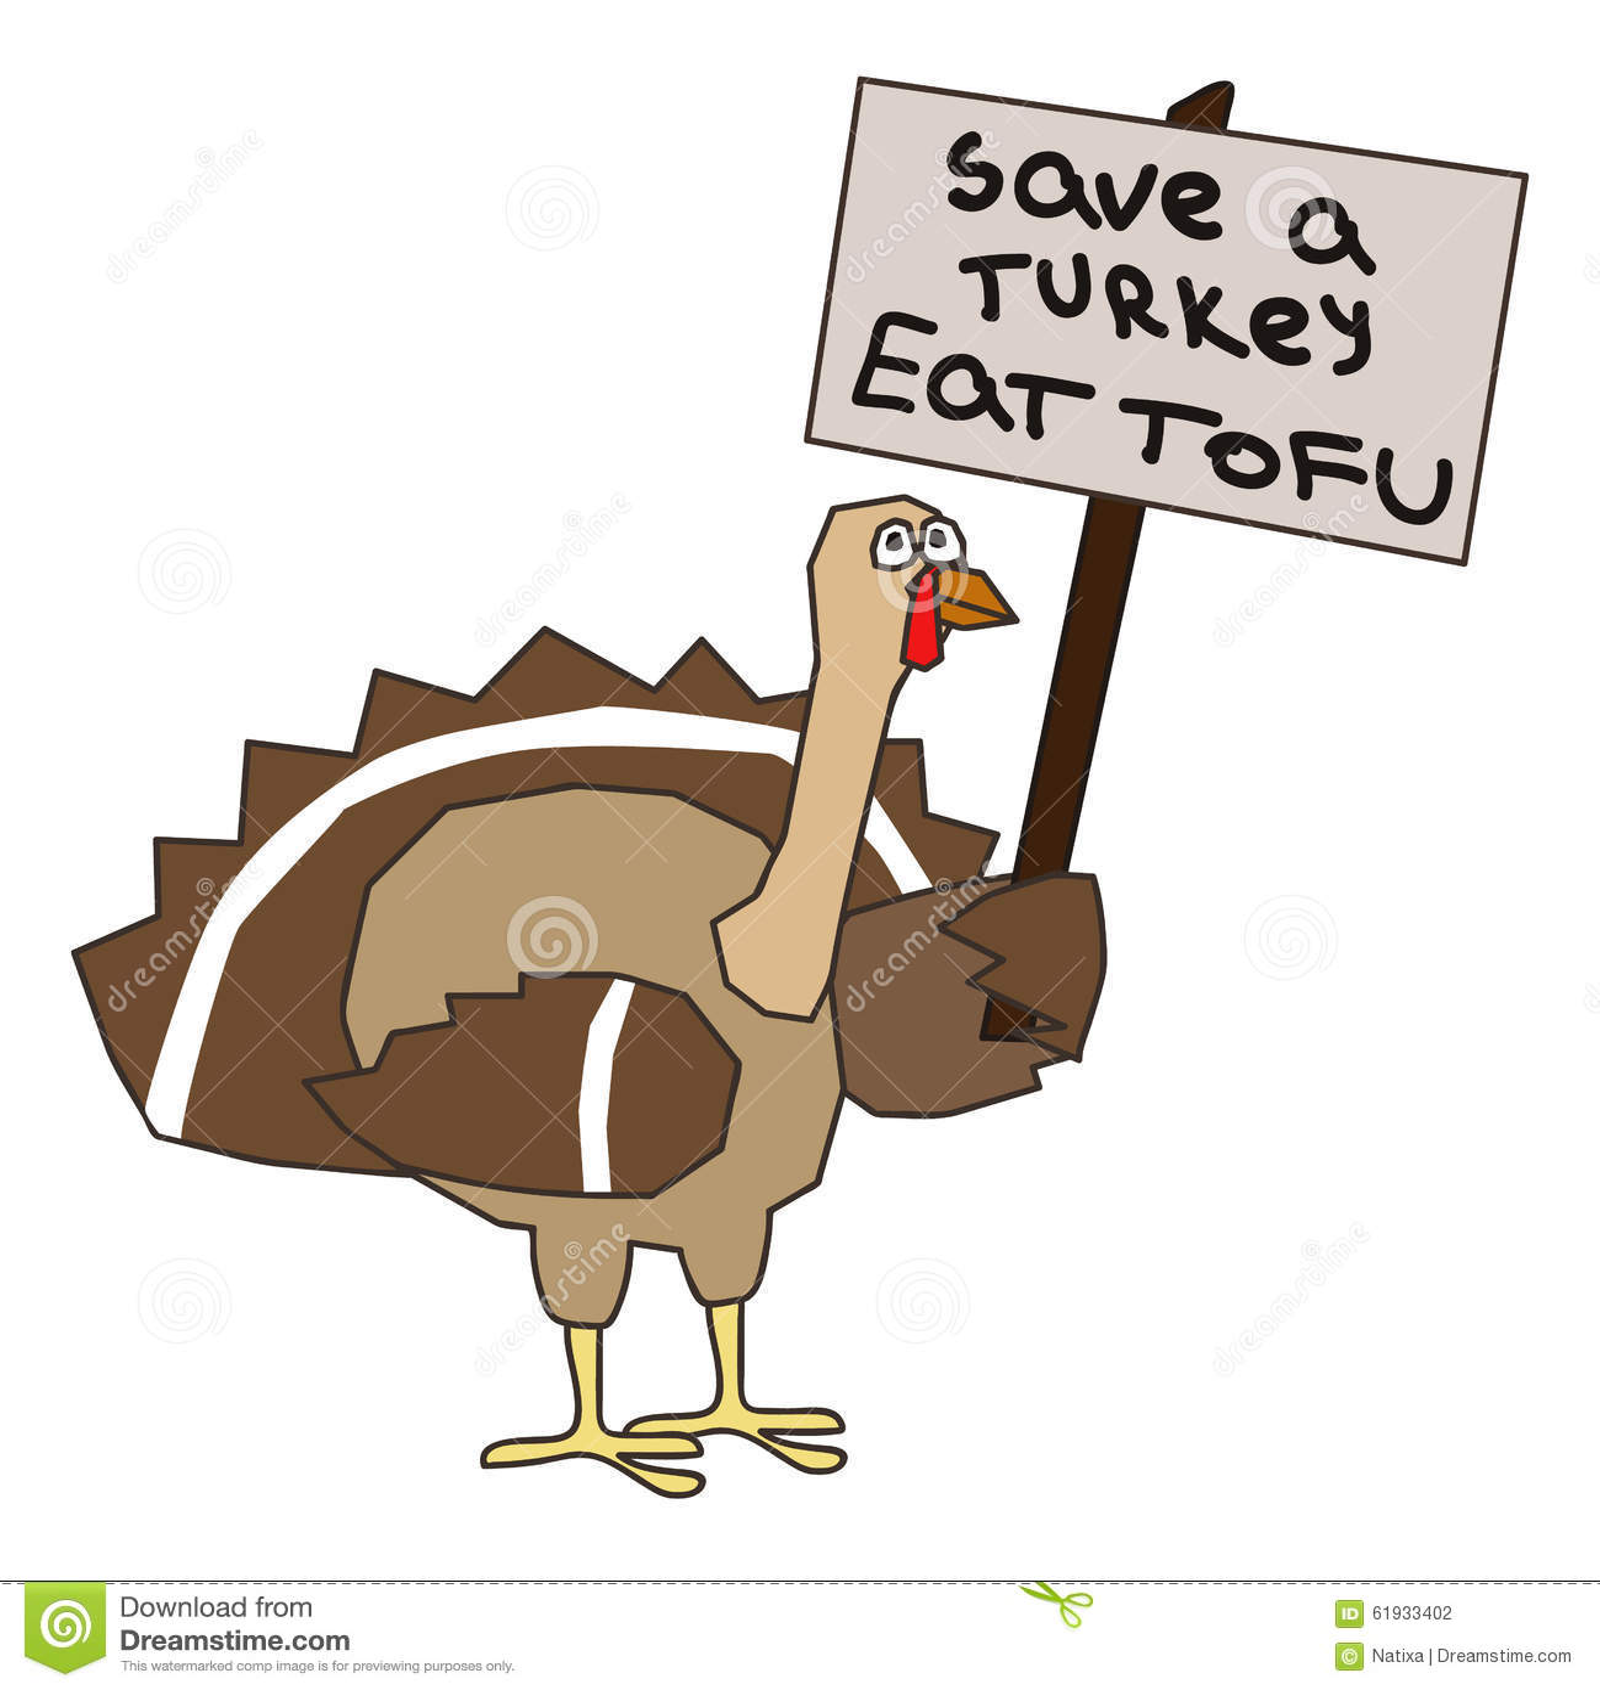 Thanksgiving Turkey Funny Vector Cartoon Stock Vector - Illustration of  eyes, confused: 78903651